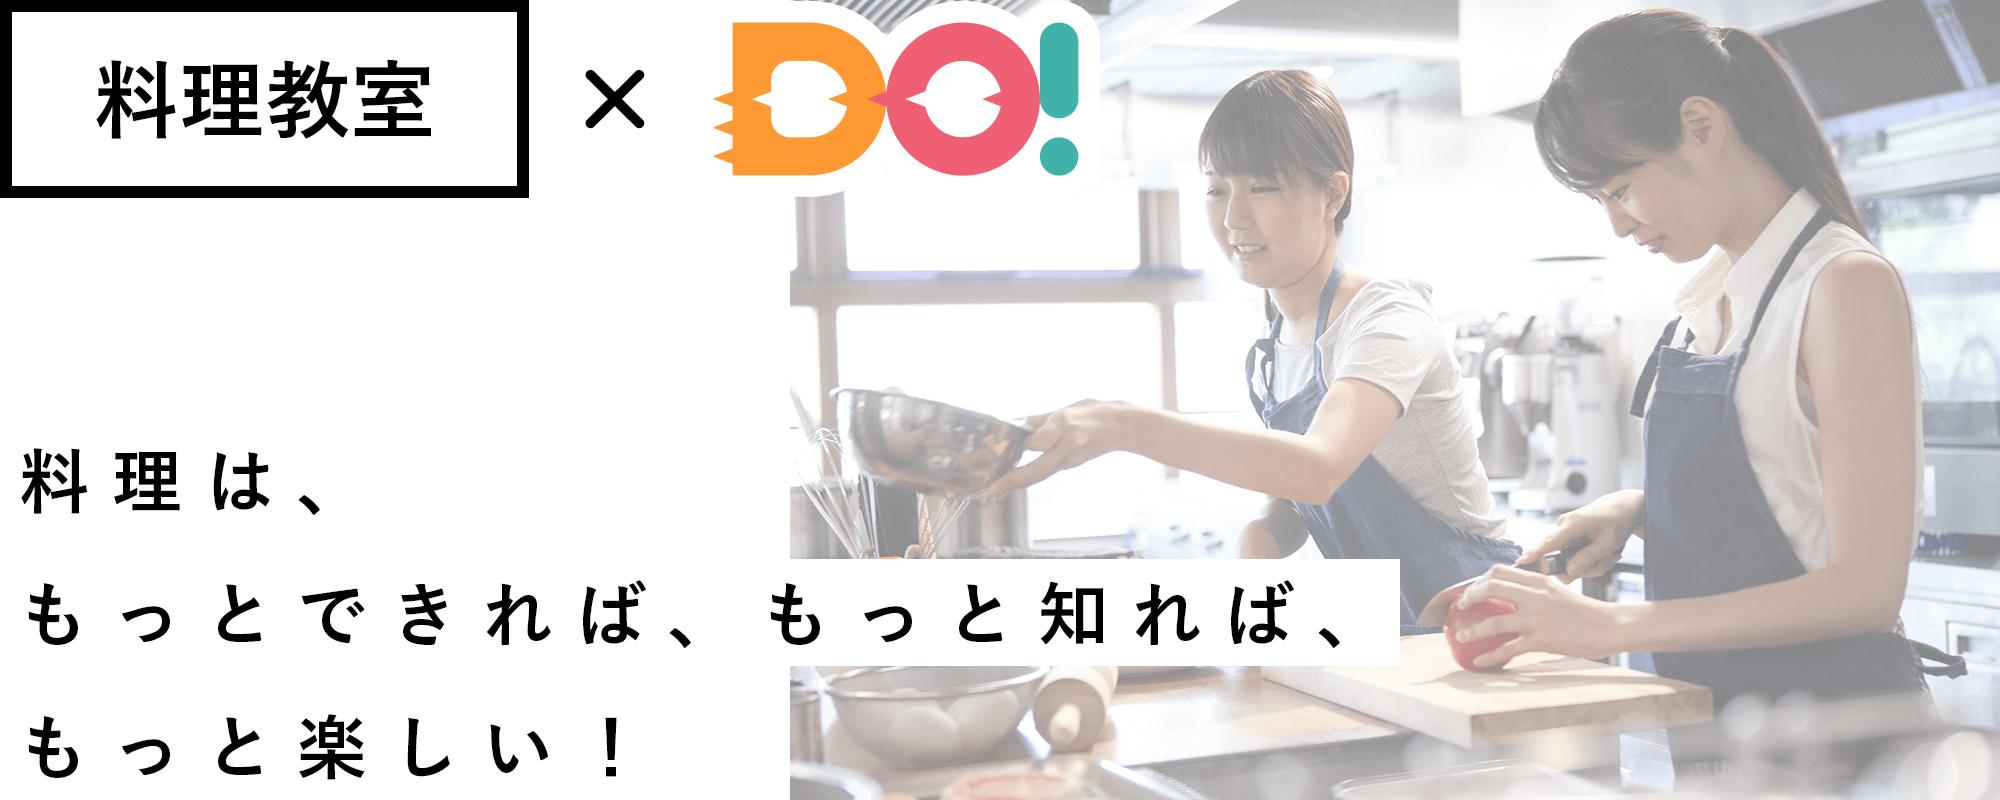 料理教室×Do!